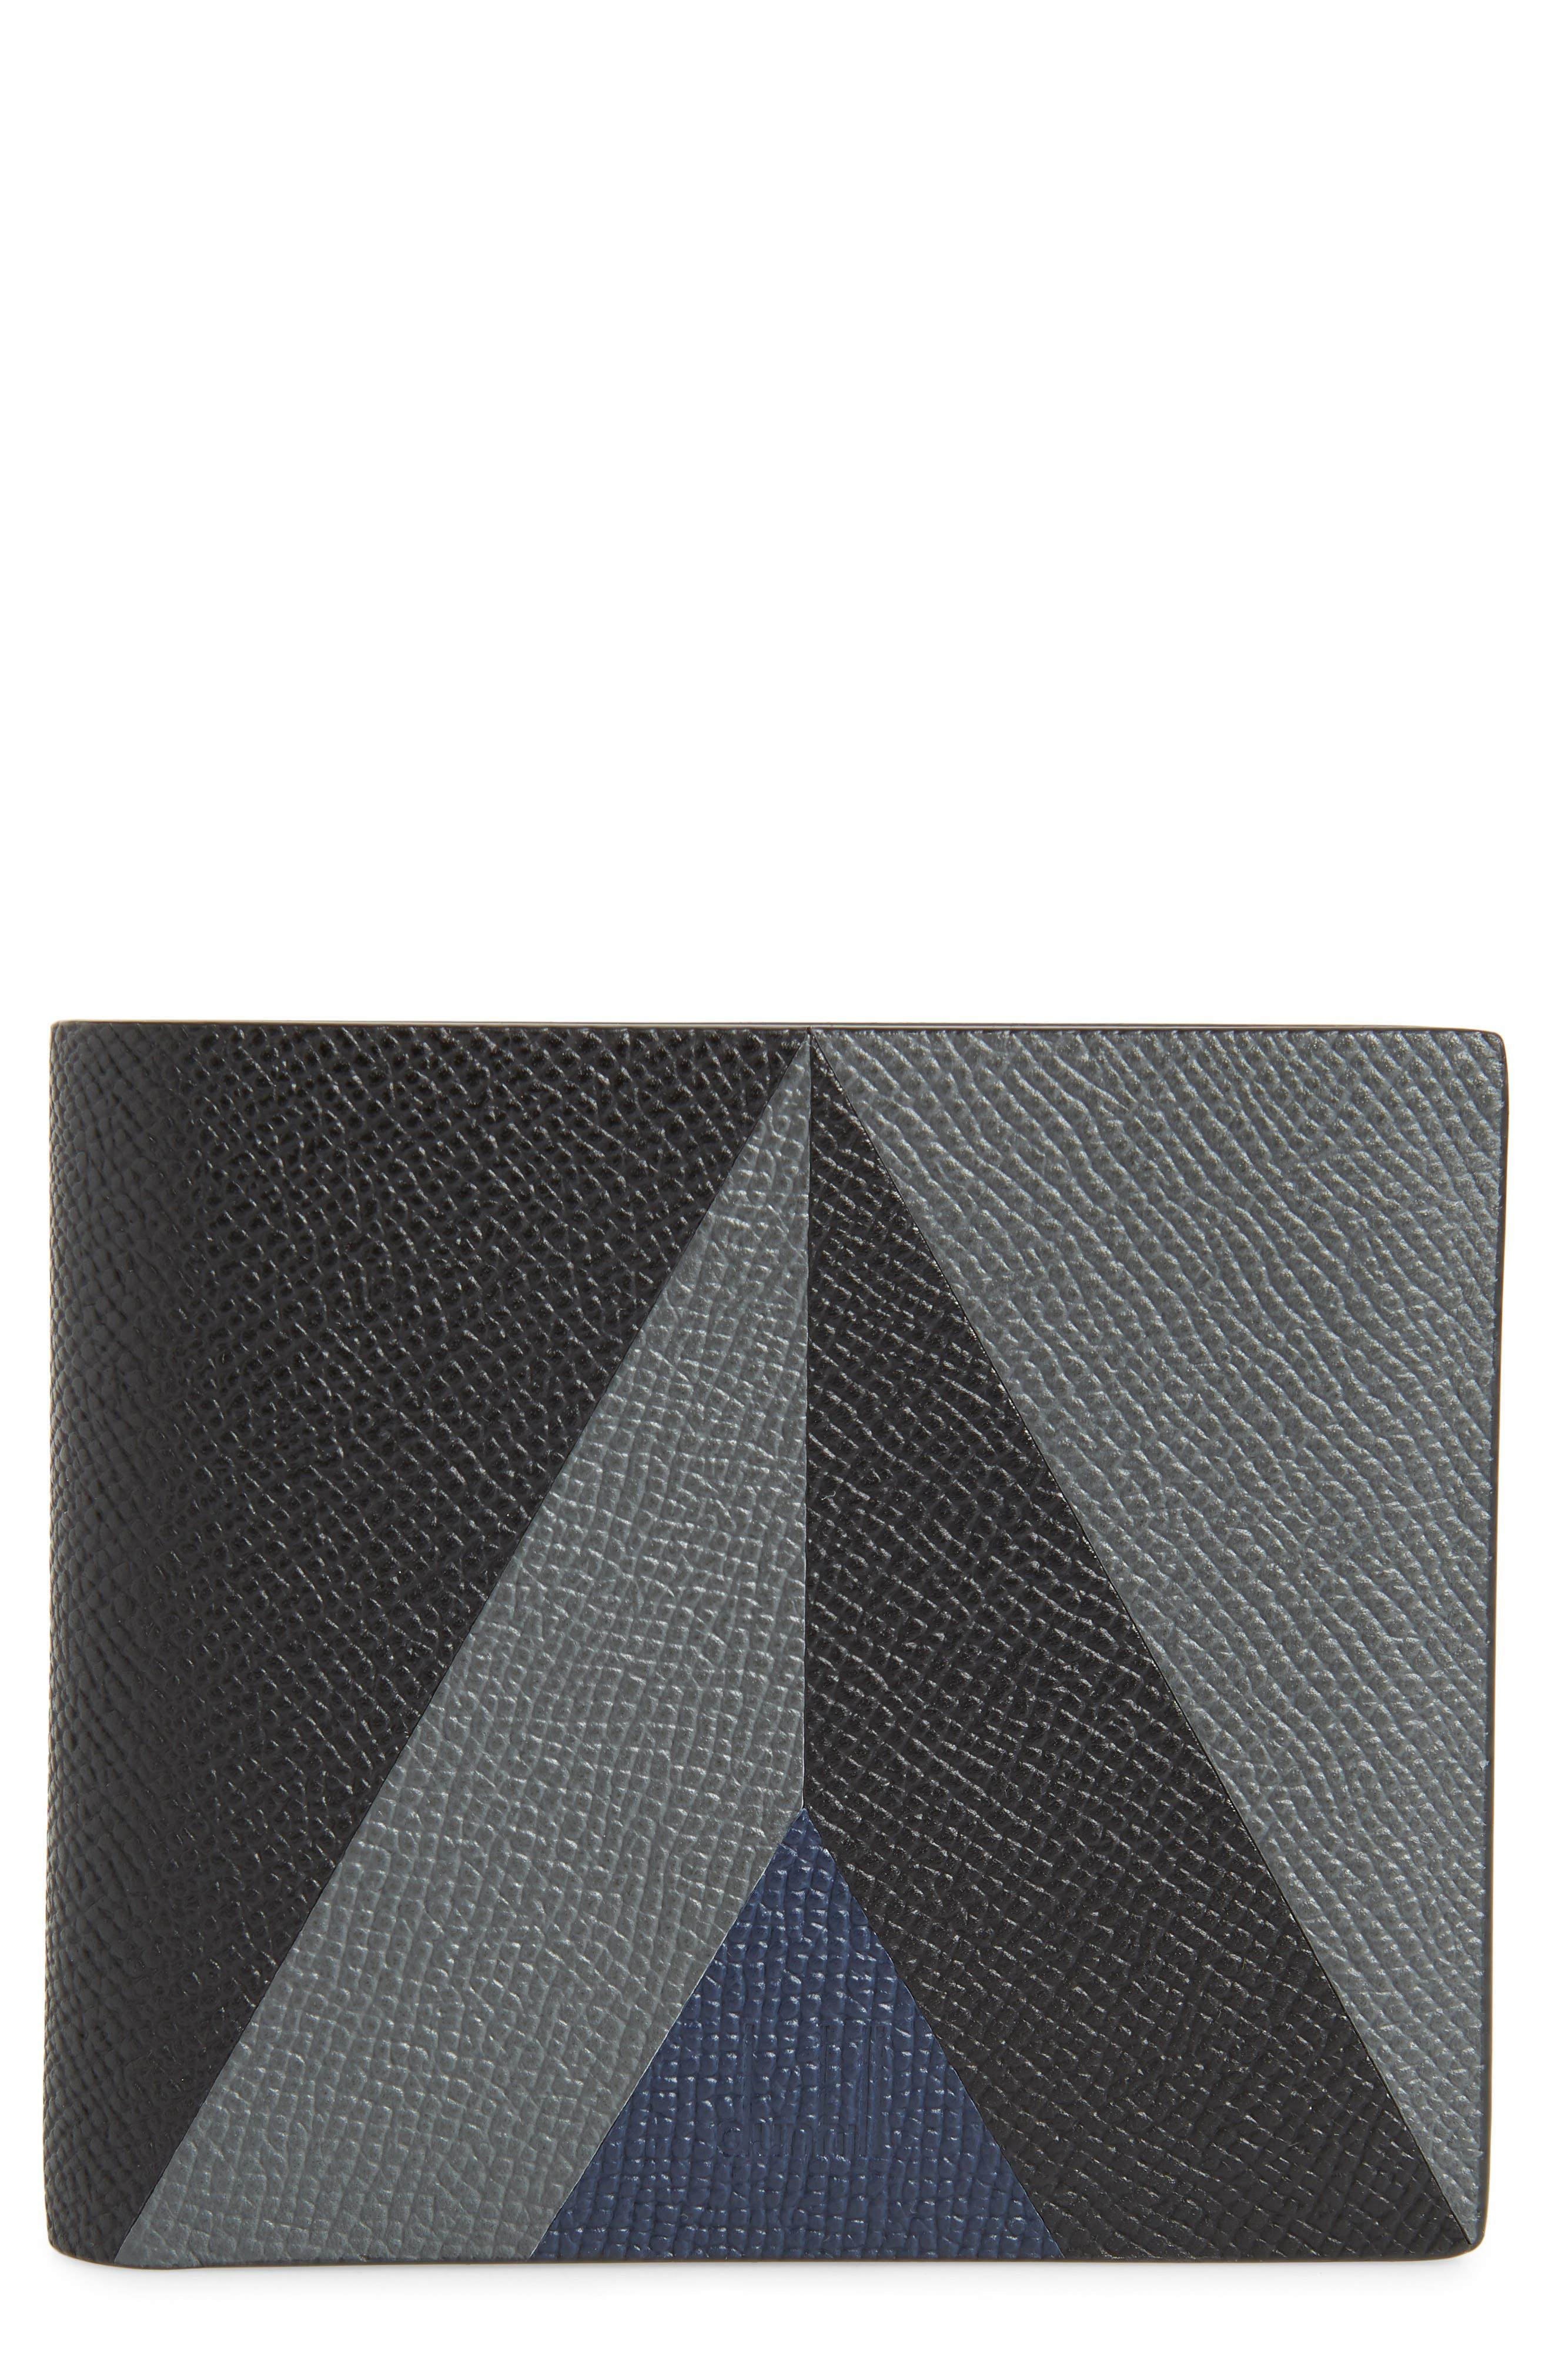 Dunhill Cadogan Leather Wallet - Black